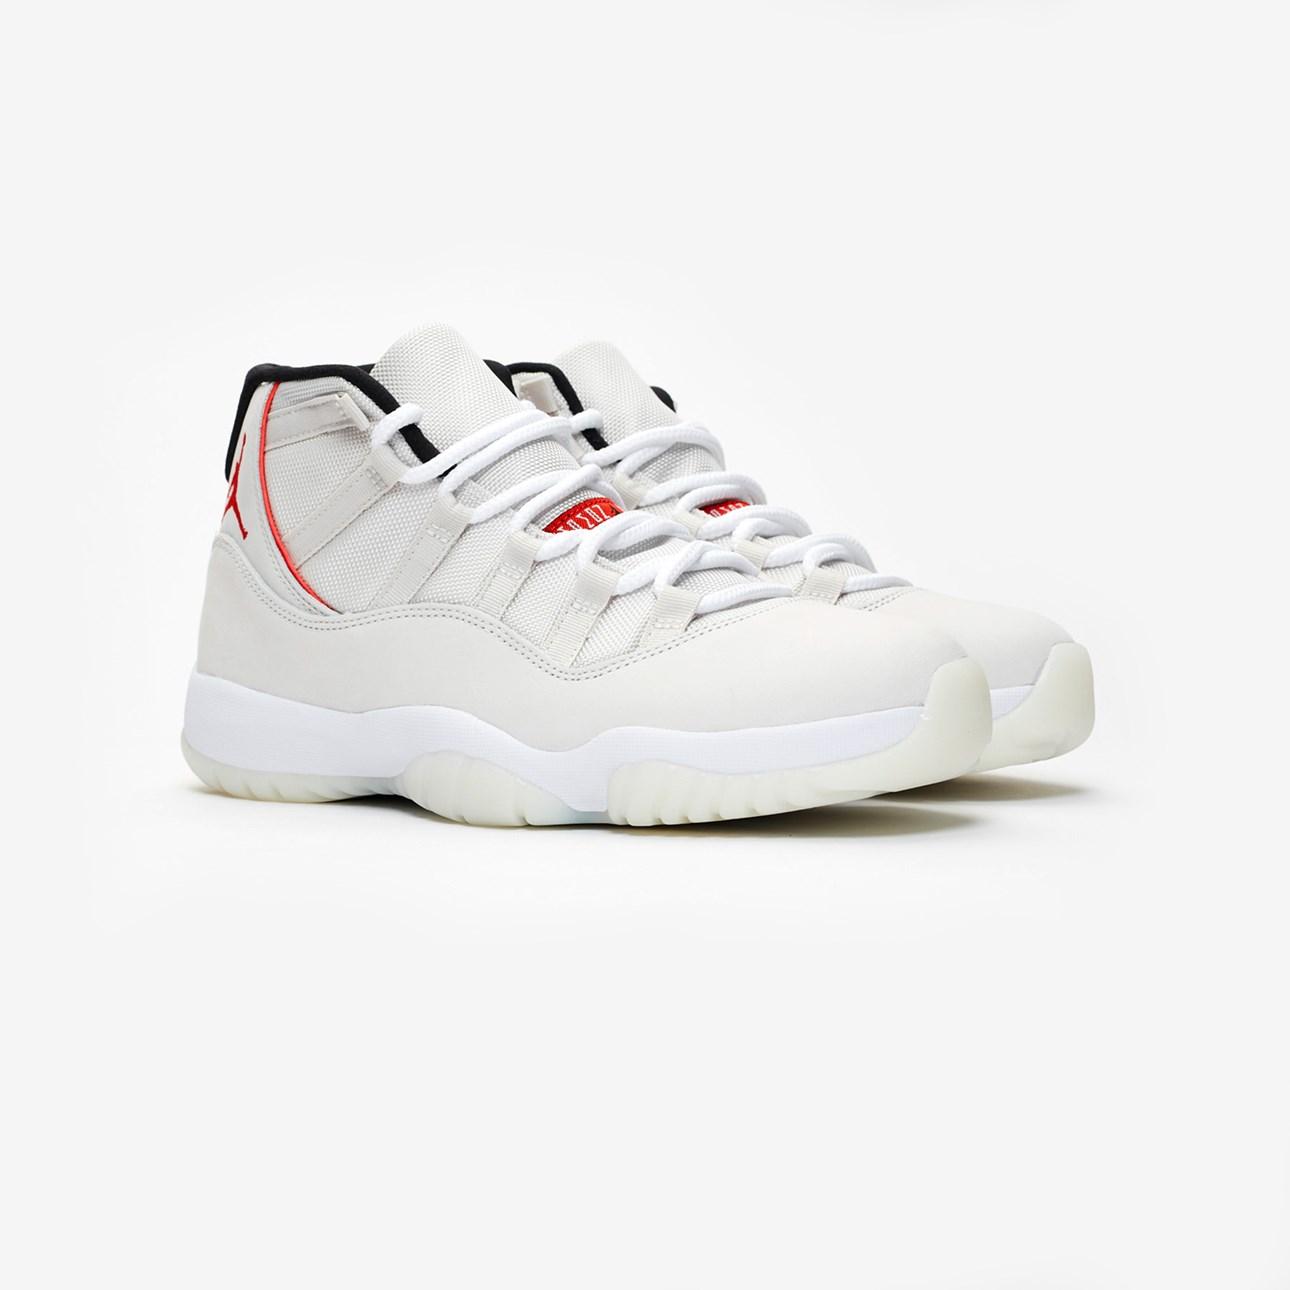 Jordan Brand Air Jordan 11 Retro